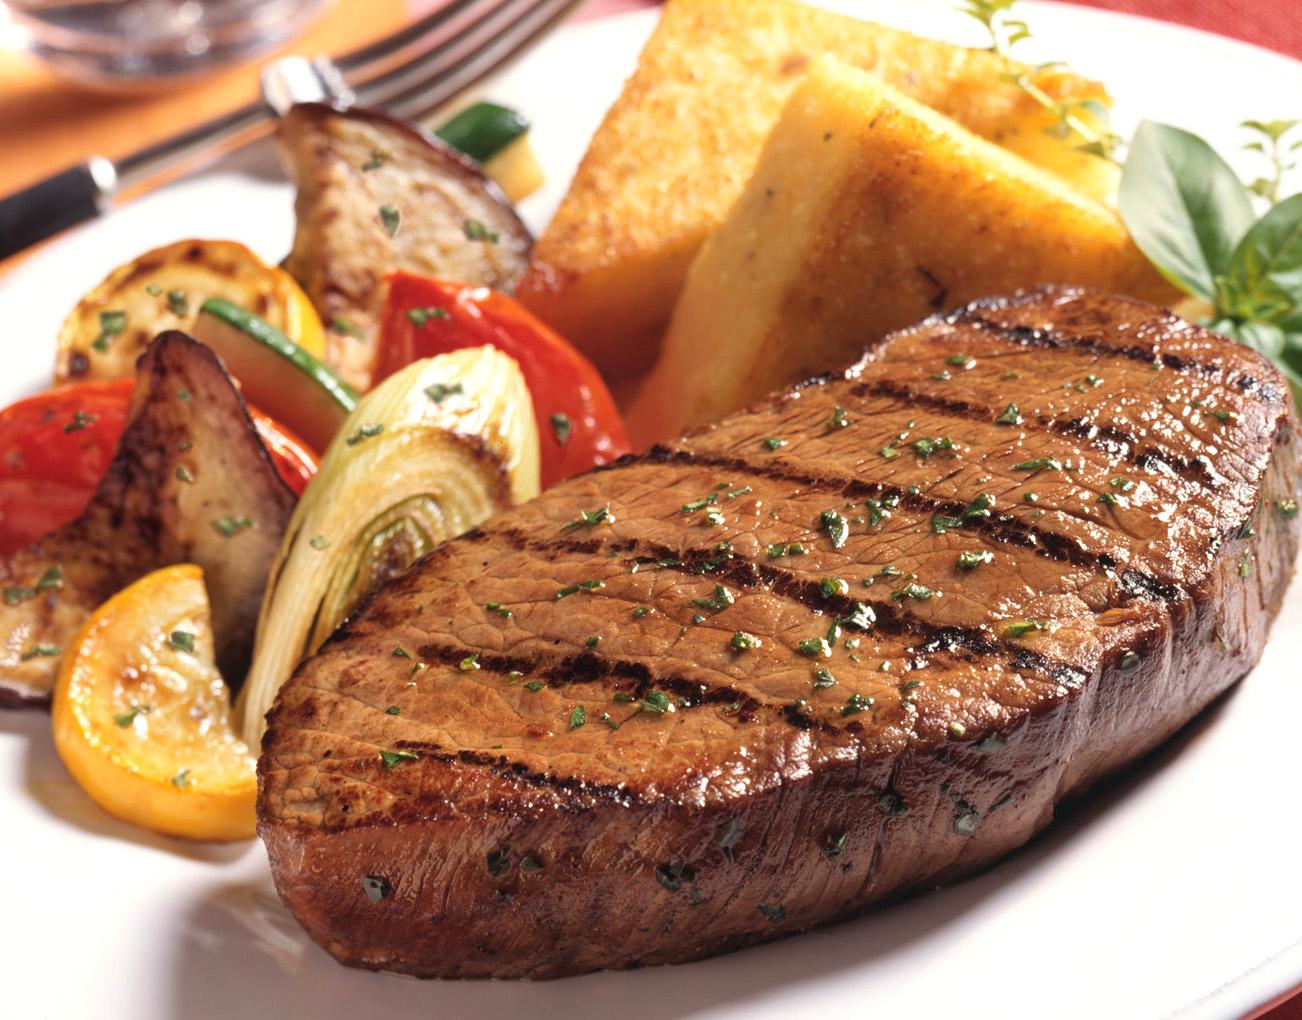 grilled-pepper-steak_C.F.-05.02.13.jpg